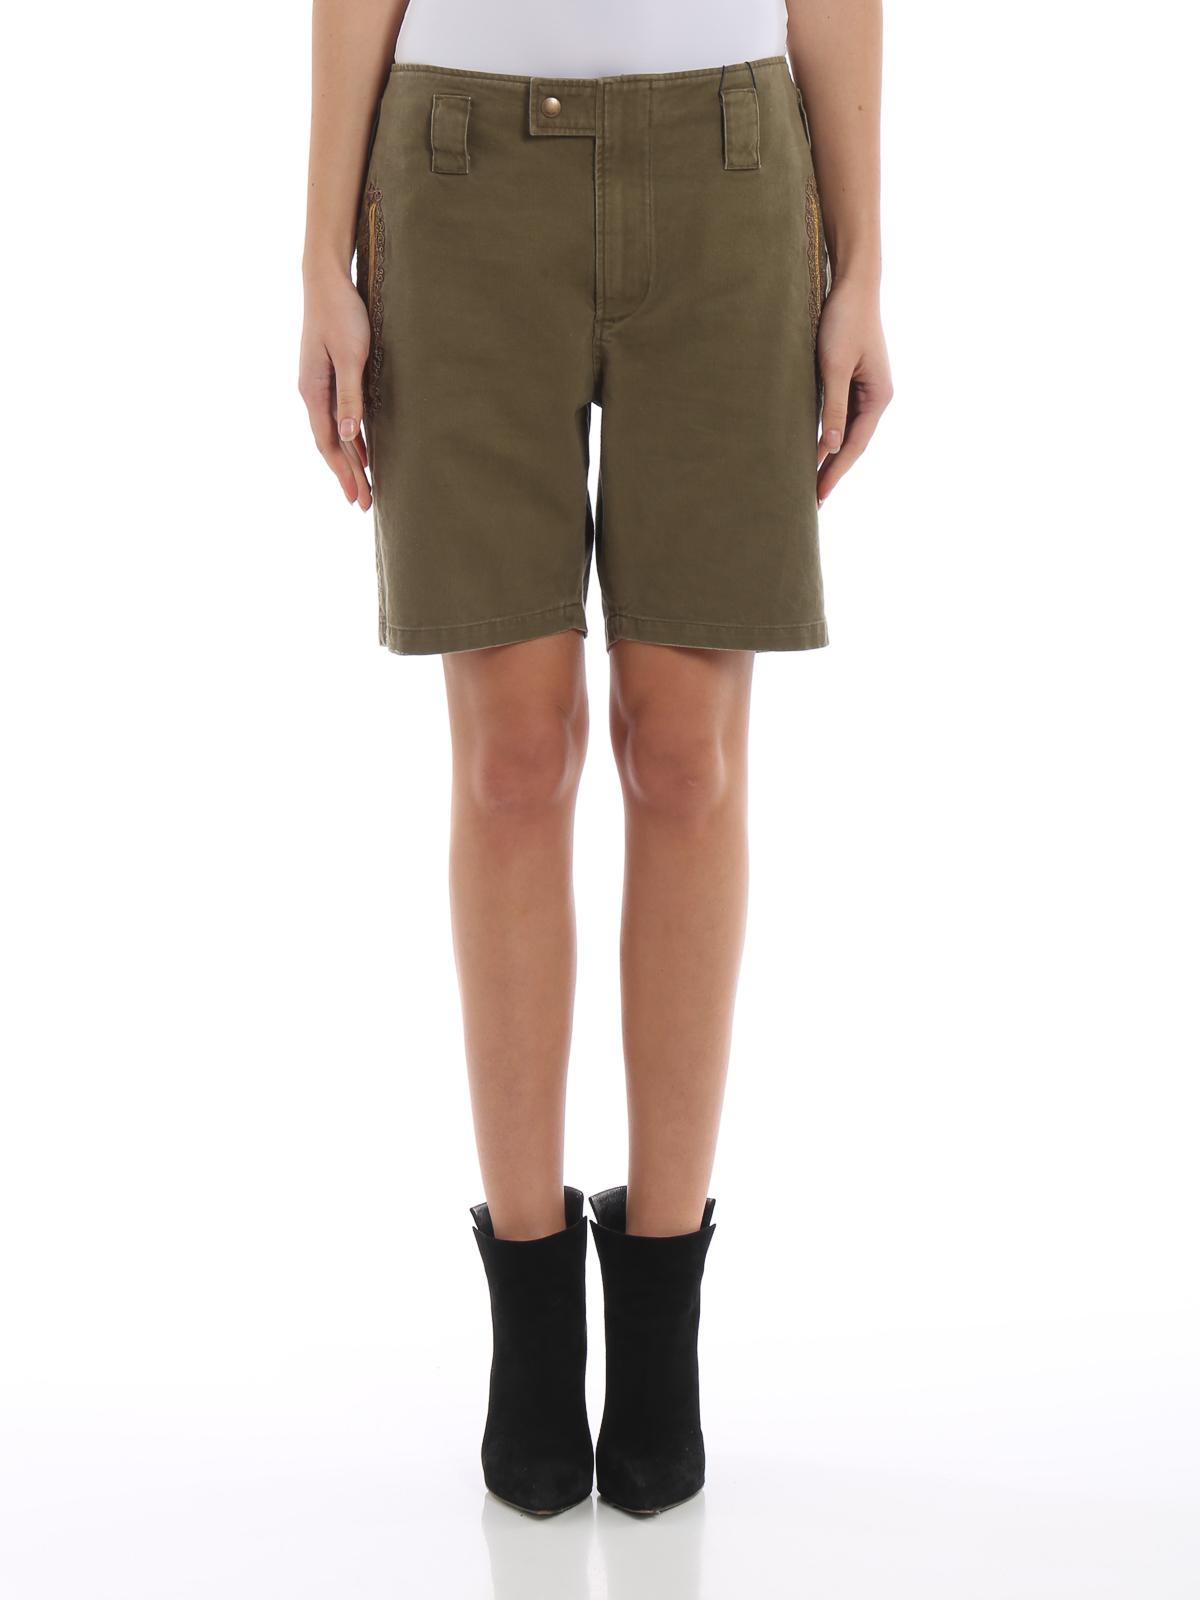 08ee1404c Saint Laurent - Army green cotton blend shorts - Trousers Shorts ...